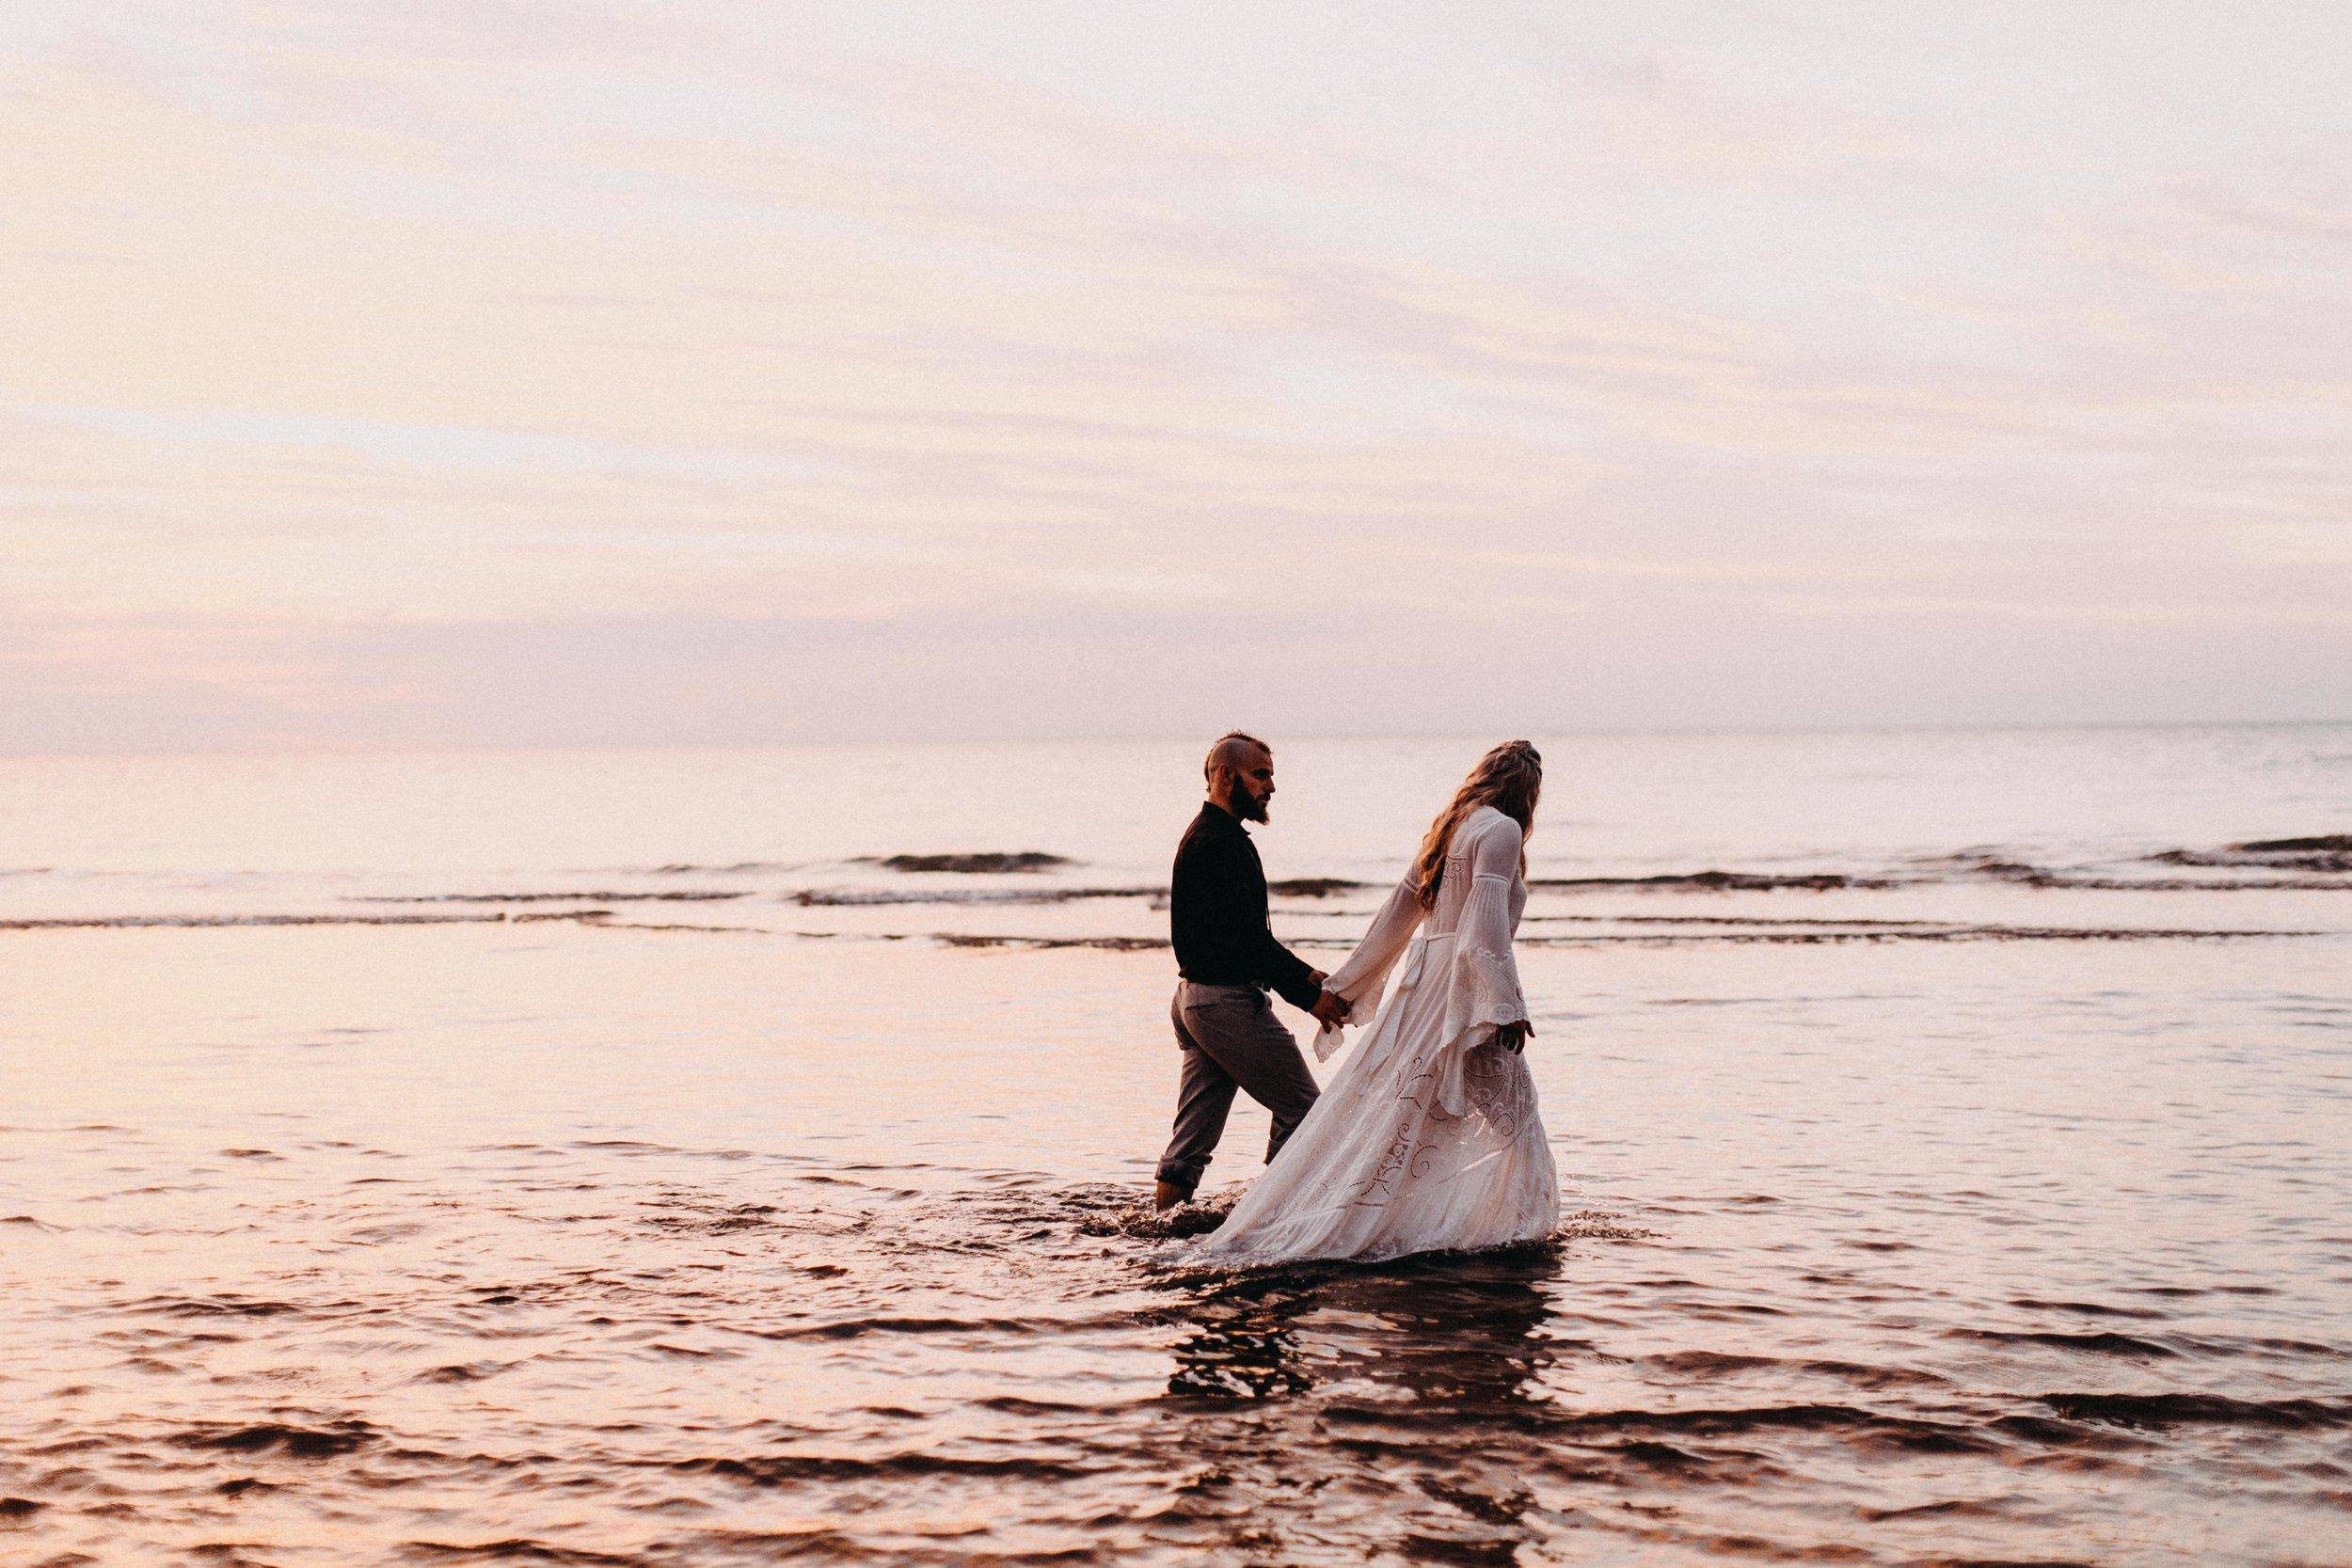 darwin-elopement-wedding-beach-camden-photography-www.emilyobrienphotography.net-103.jpg